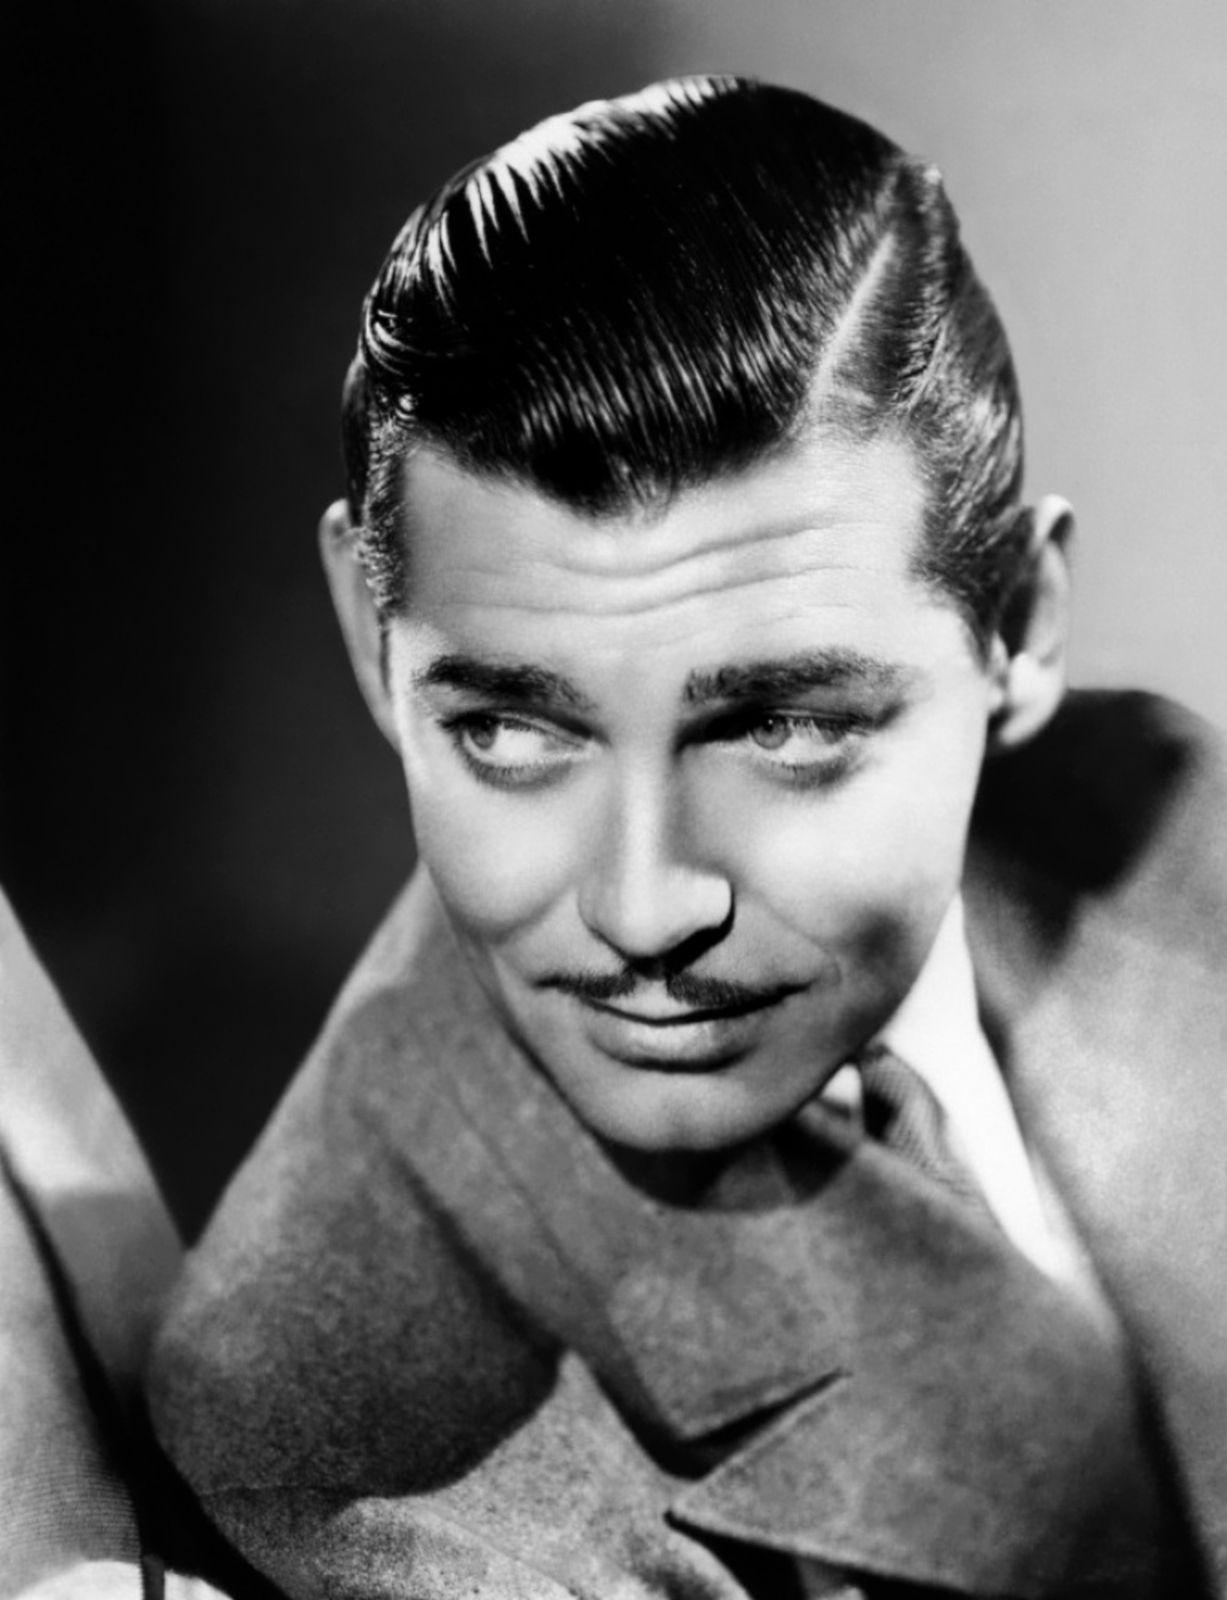 1950s Hairstyles Mens Must You Choosen Mens Hairstyles Slick Hairstyles 1950s Mens Hairstyles